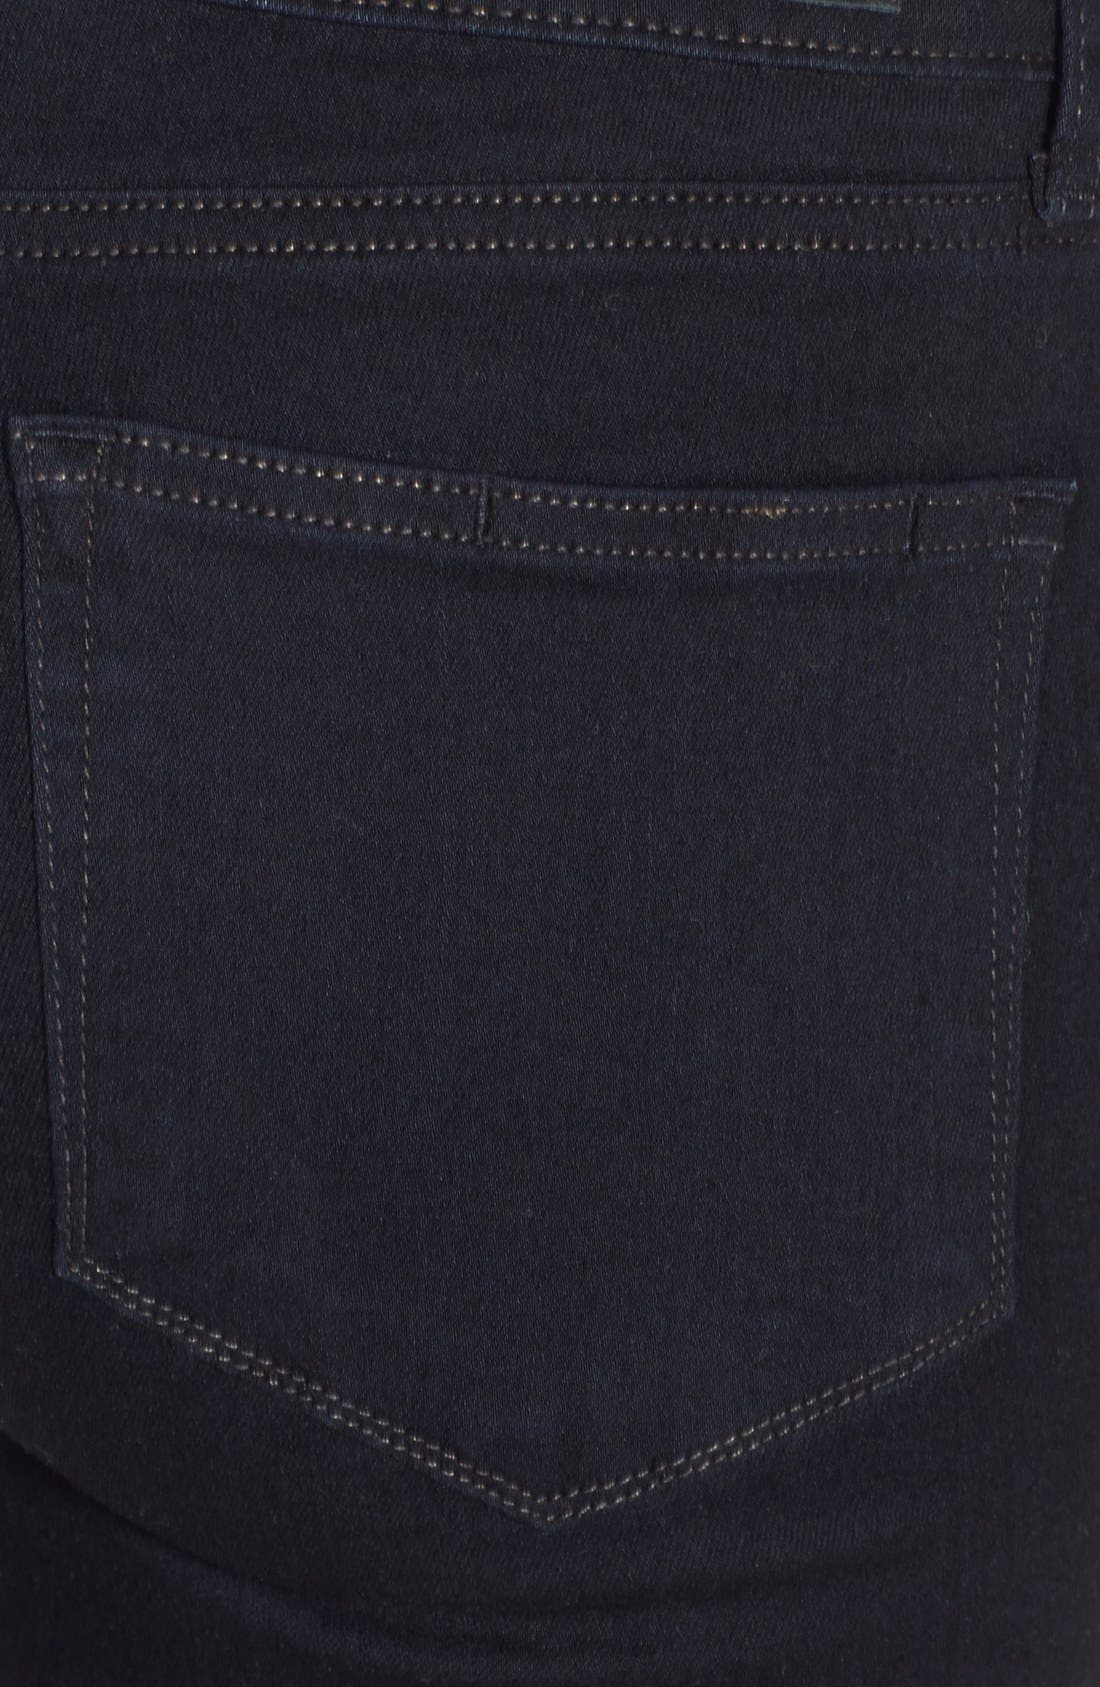 Alternate Image 3  - Paige Denim 'Verdugo' Skinny Ankle Jeans (Kensington)